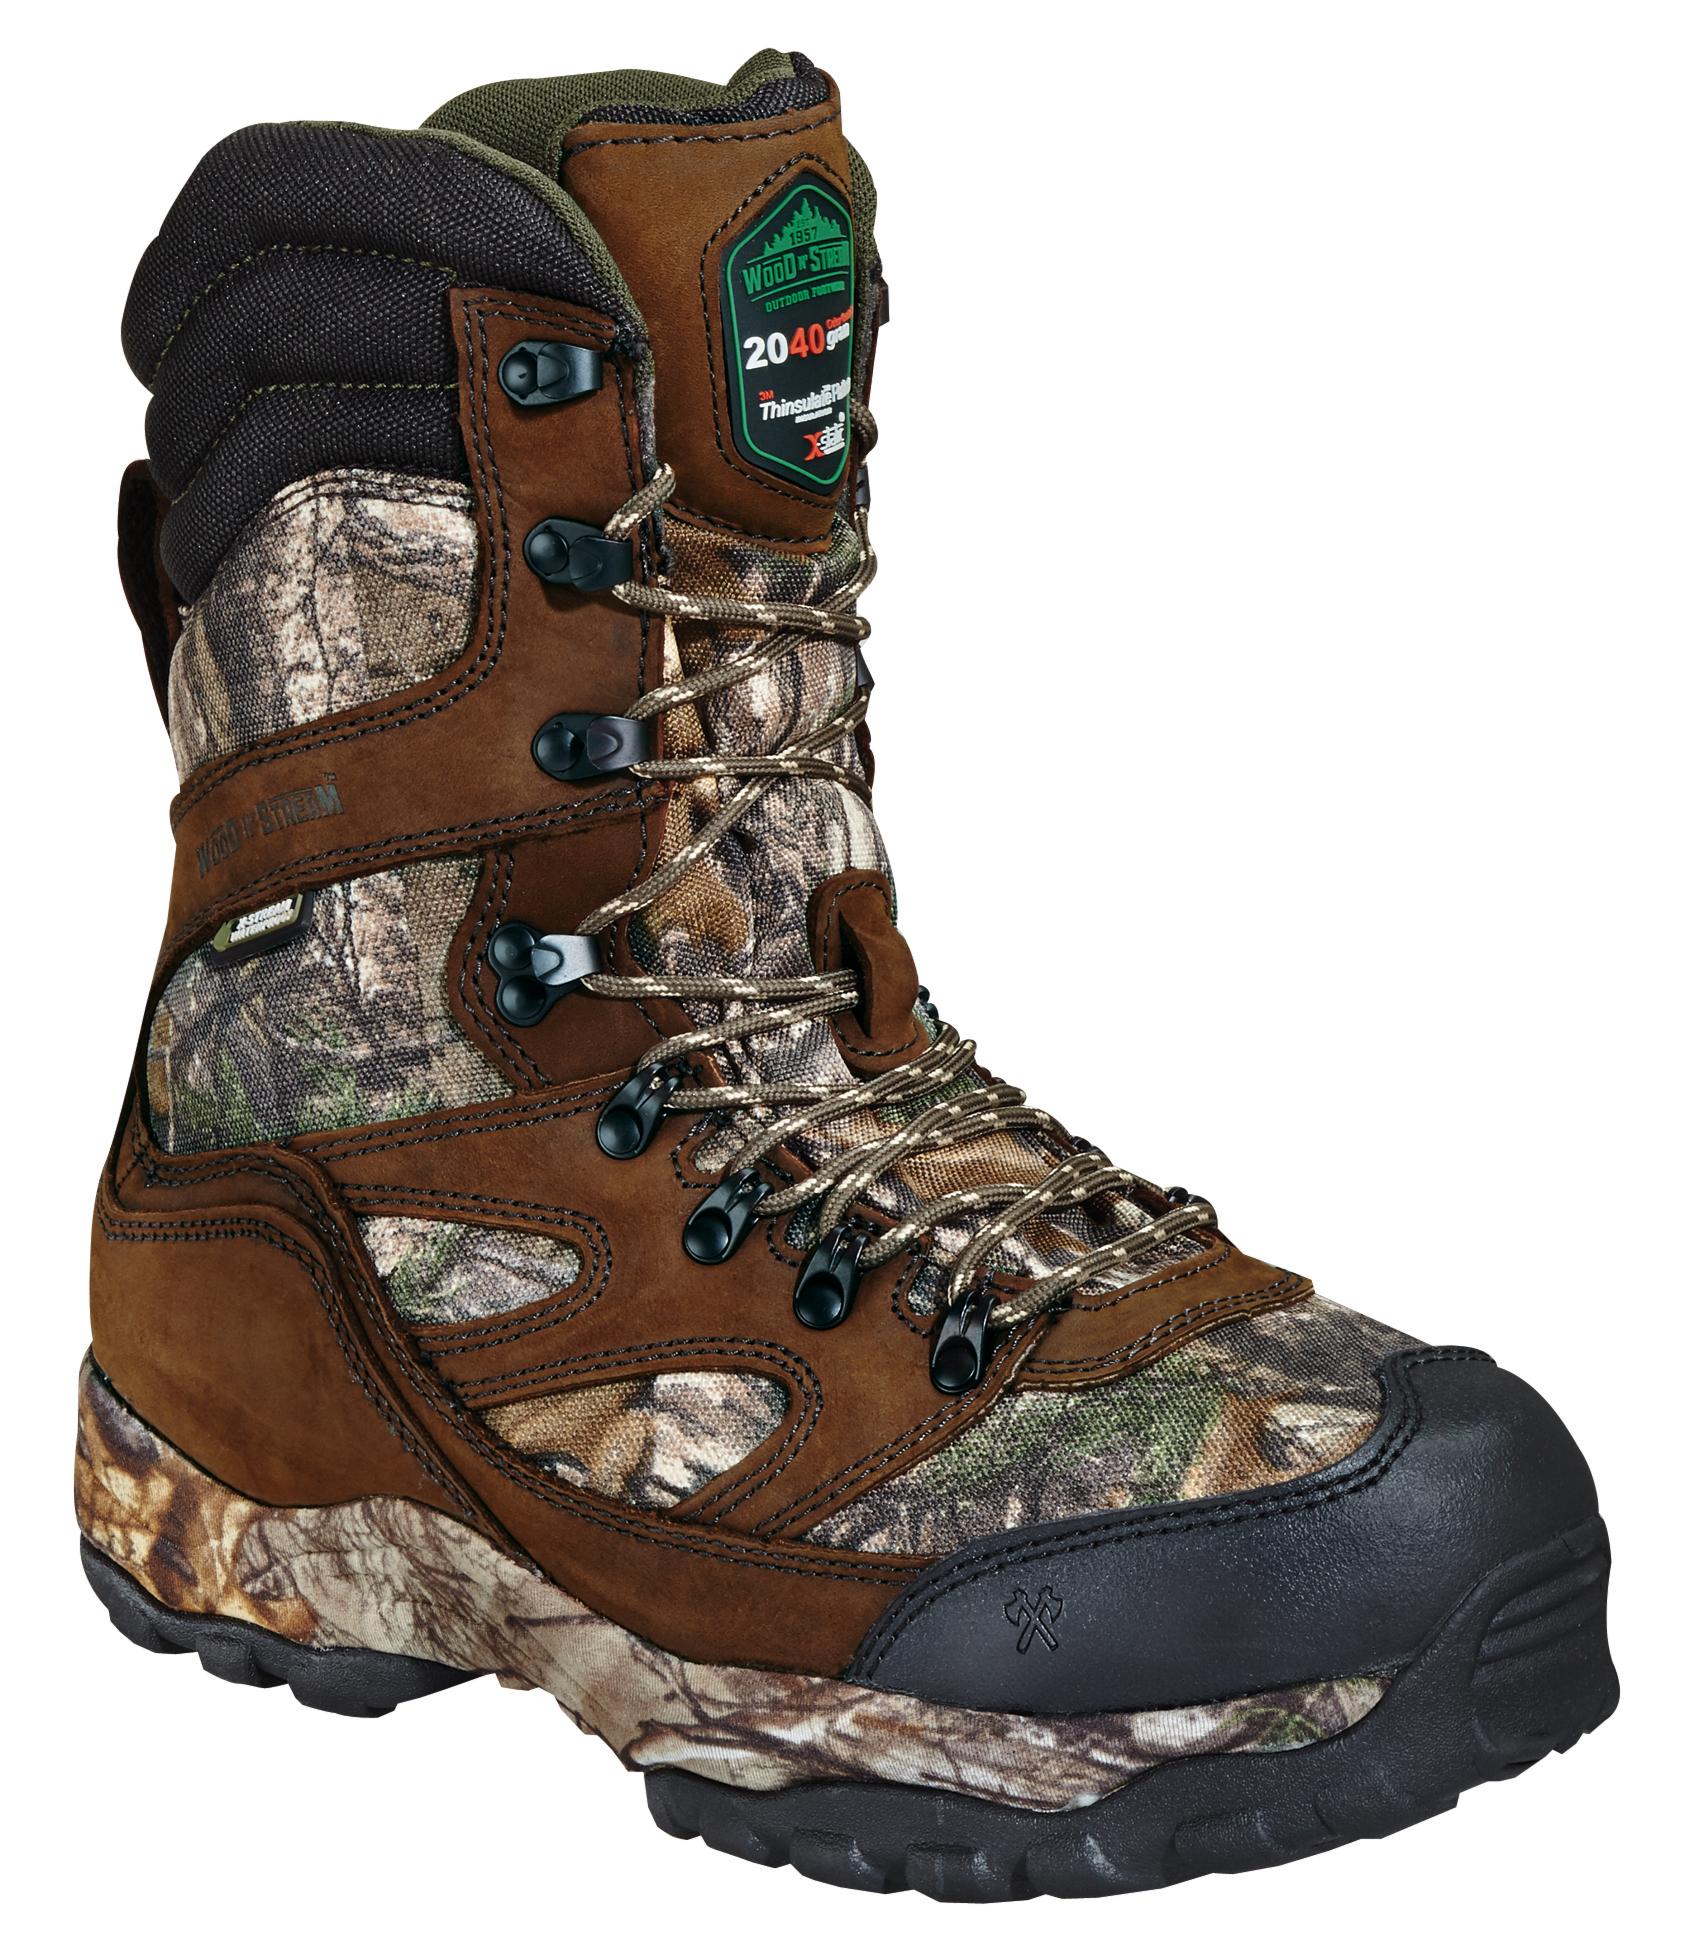 36475f0cd37 Weinbrenner Shoe Company / Thorogood Shoes